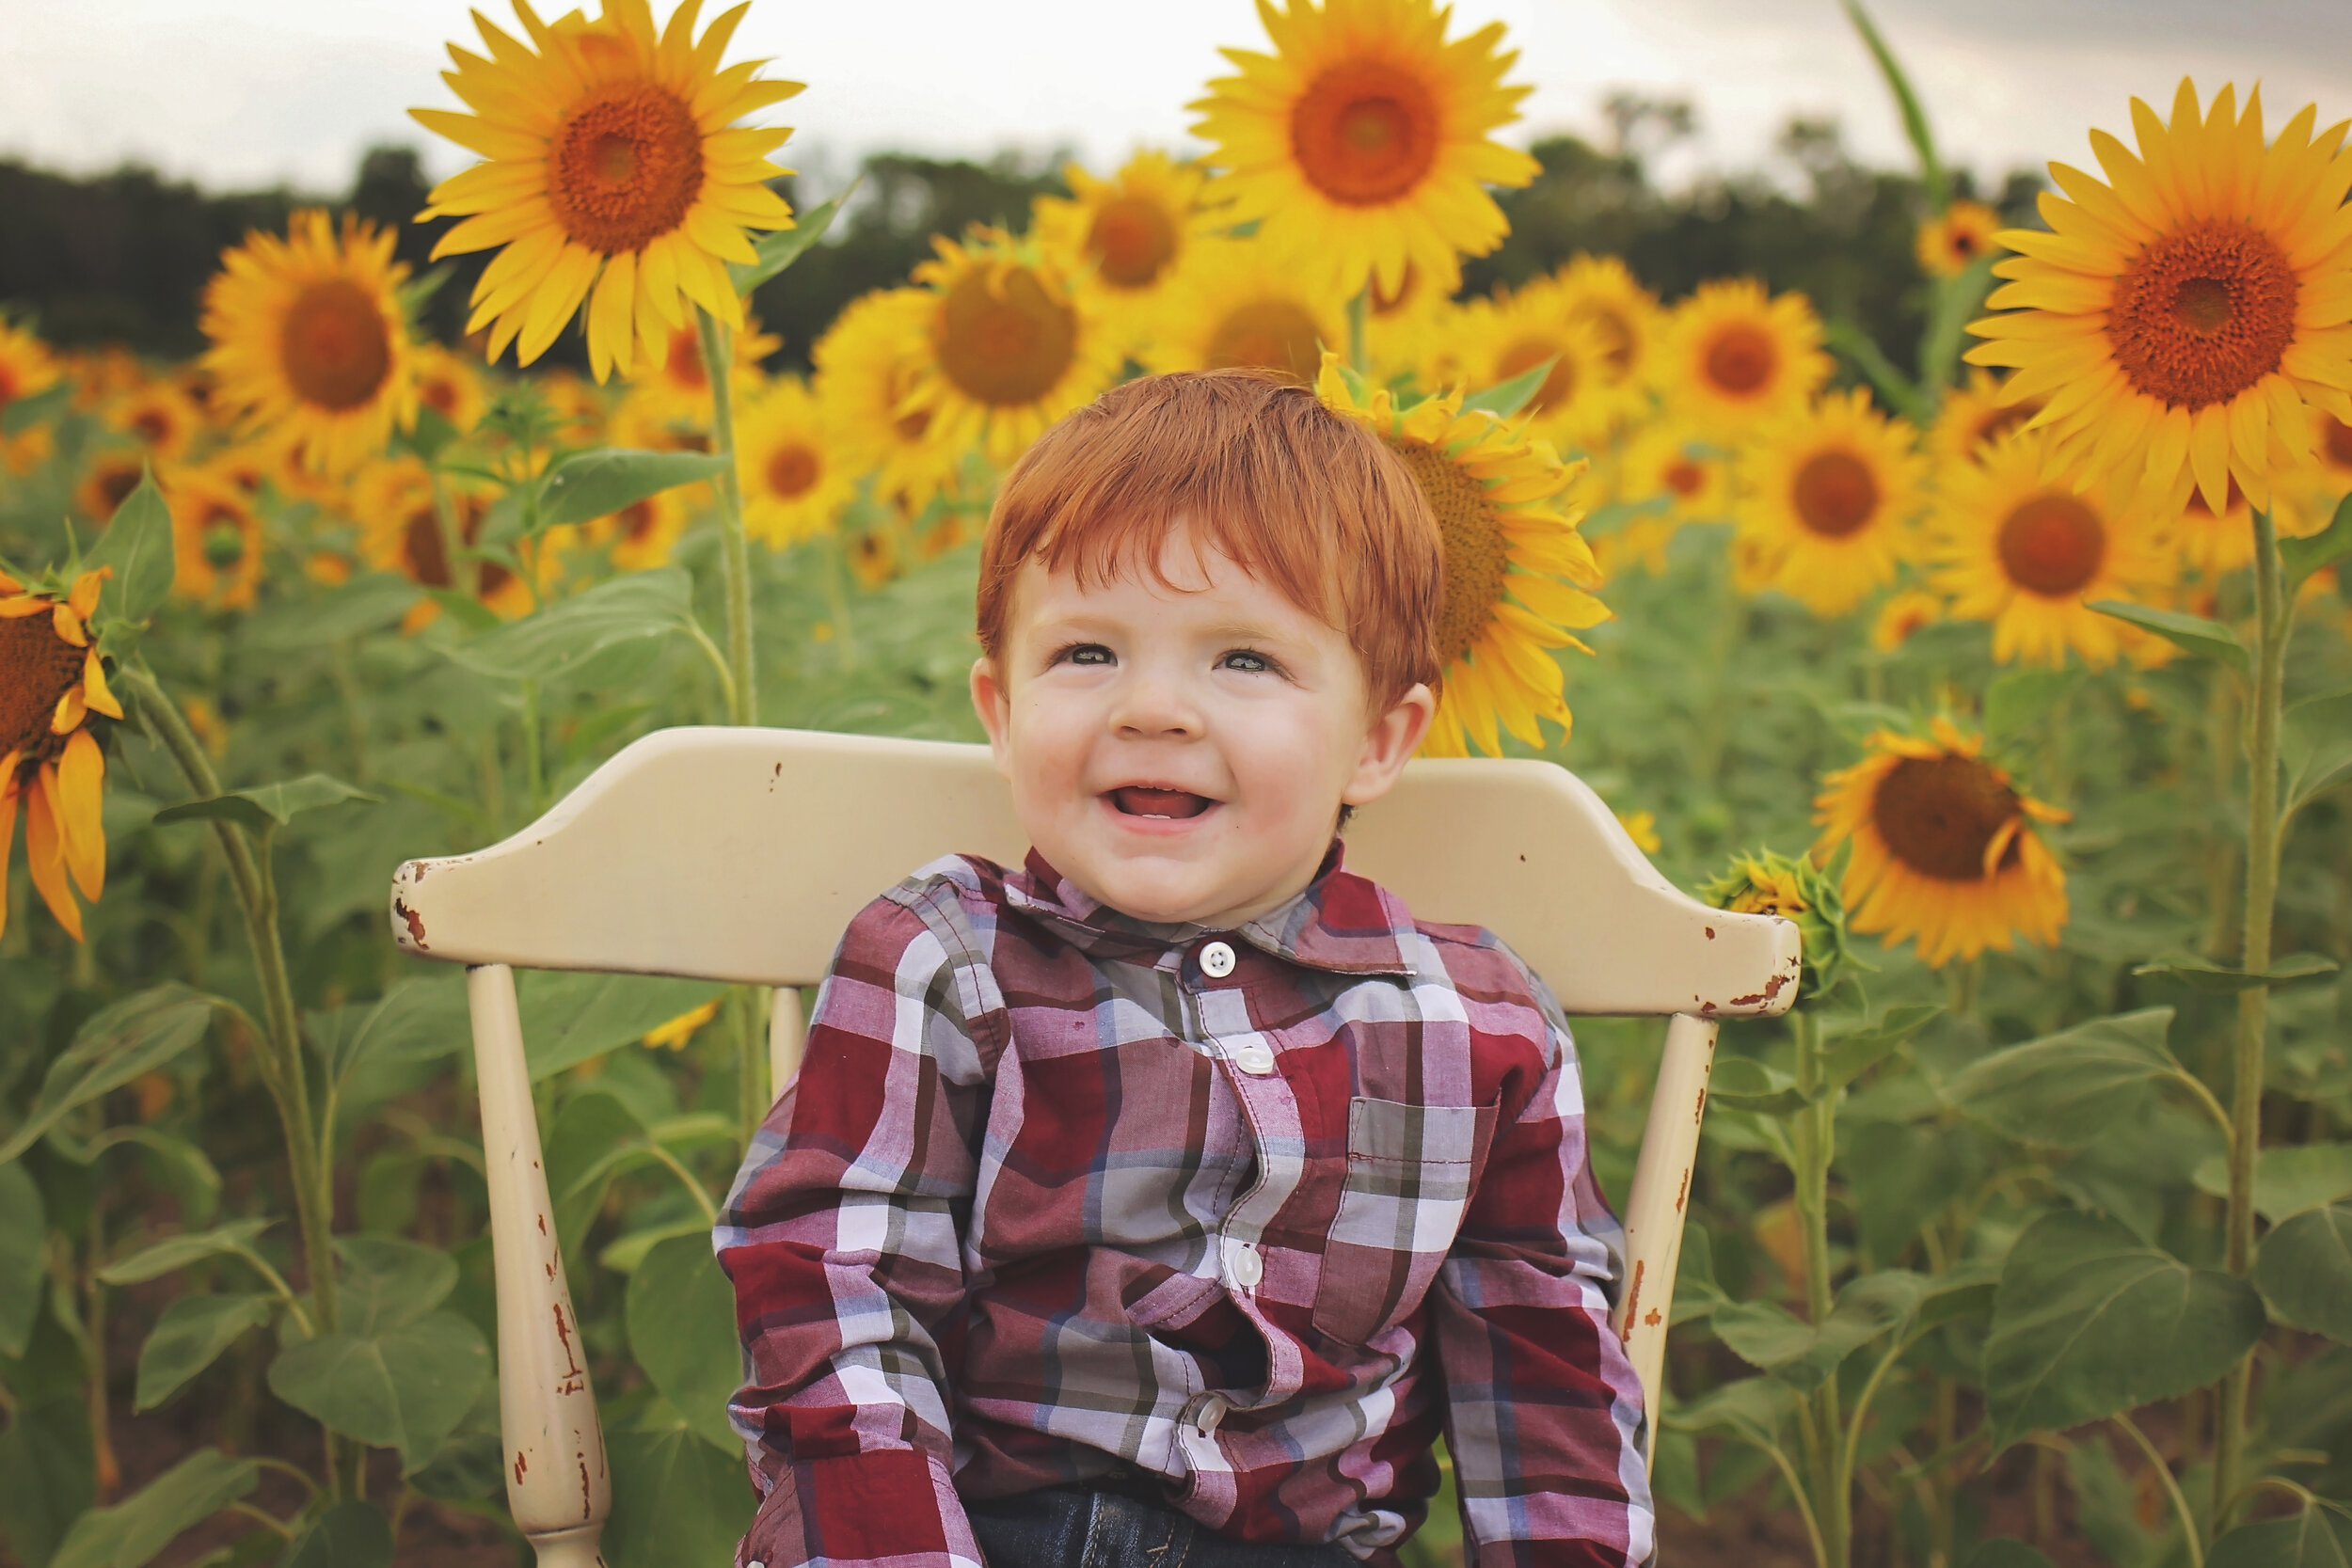 southern-illinois-photographer-benton-sunflower-field-toddler-boy.jpg